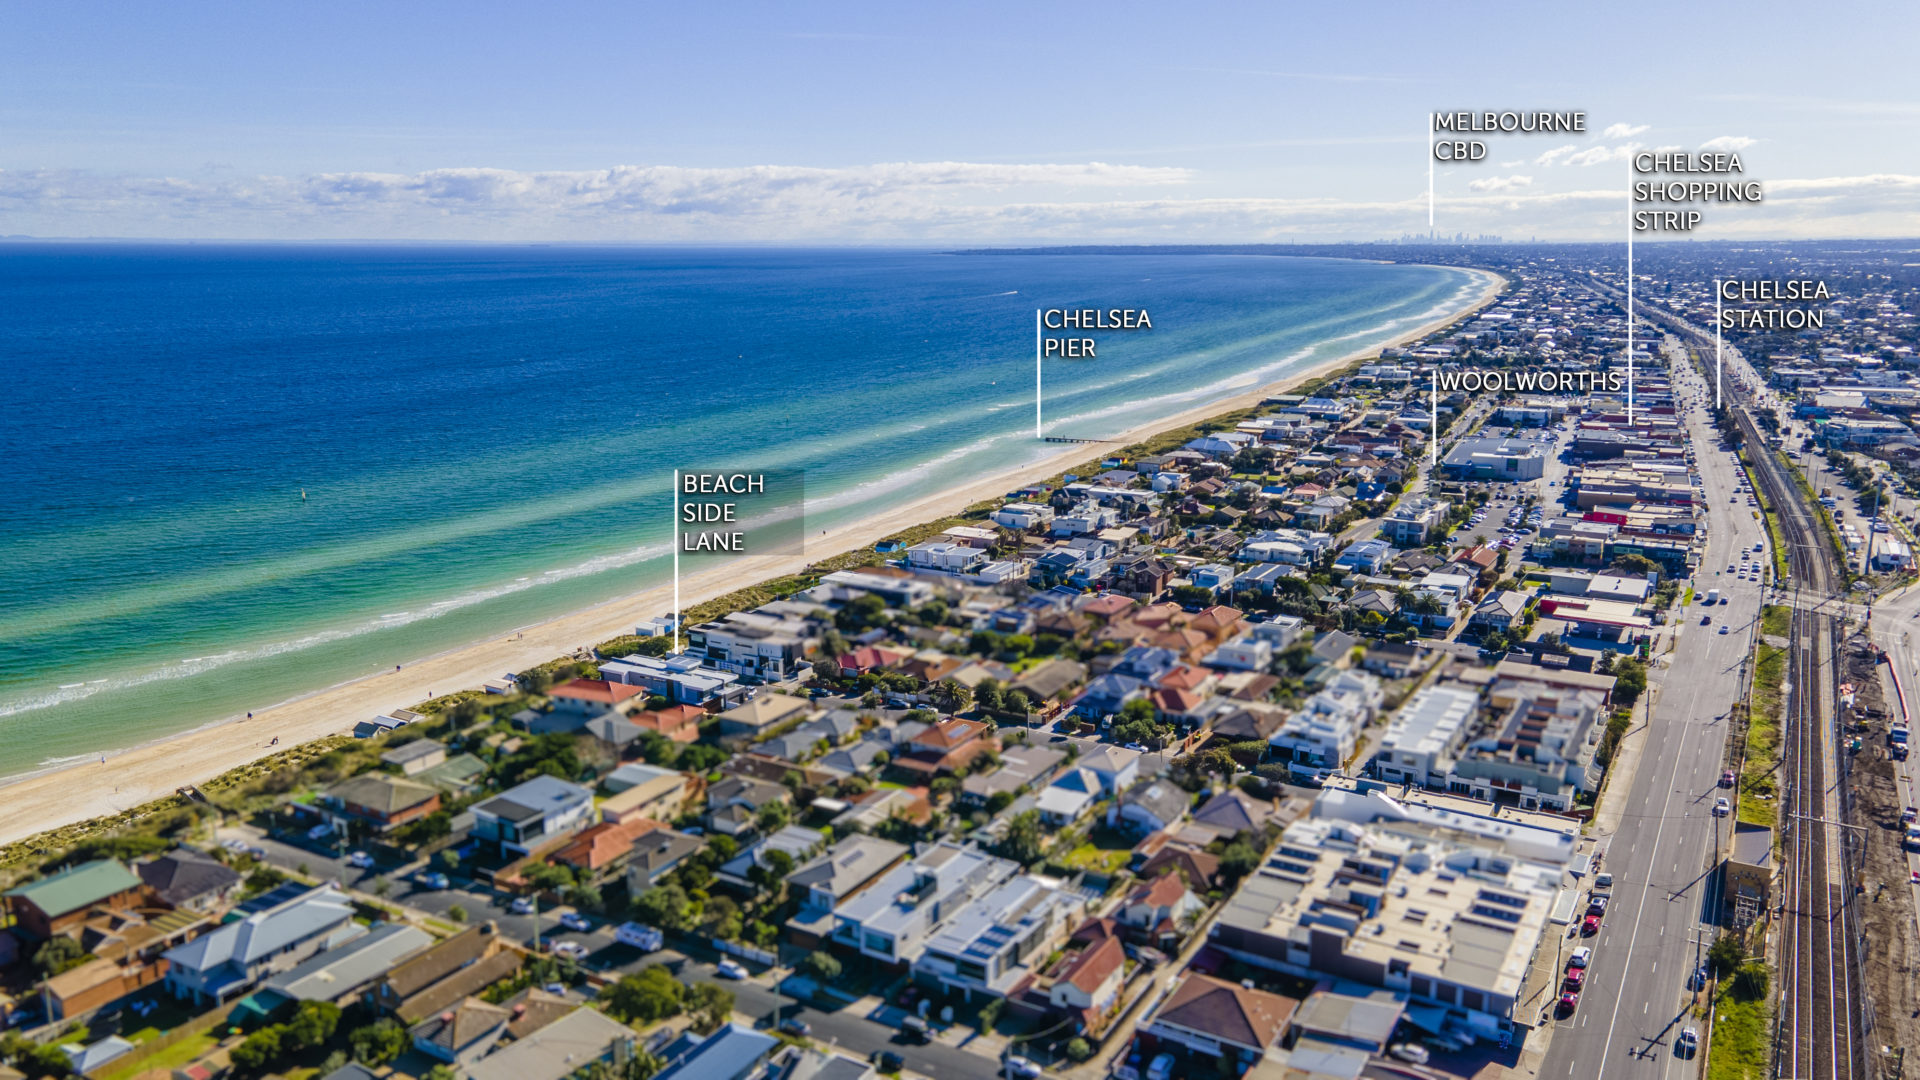 BEACH SIDE LANE.1 (1)